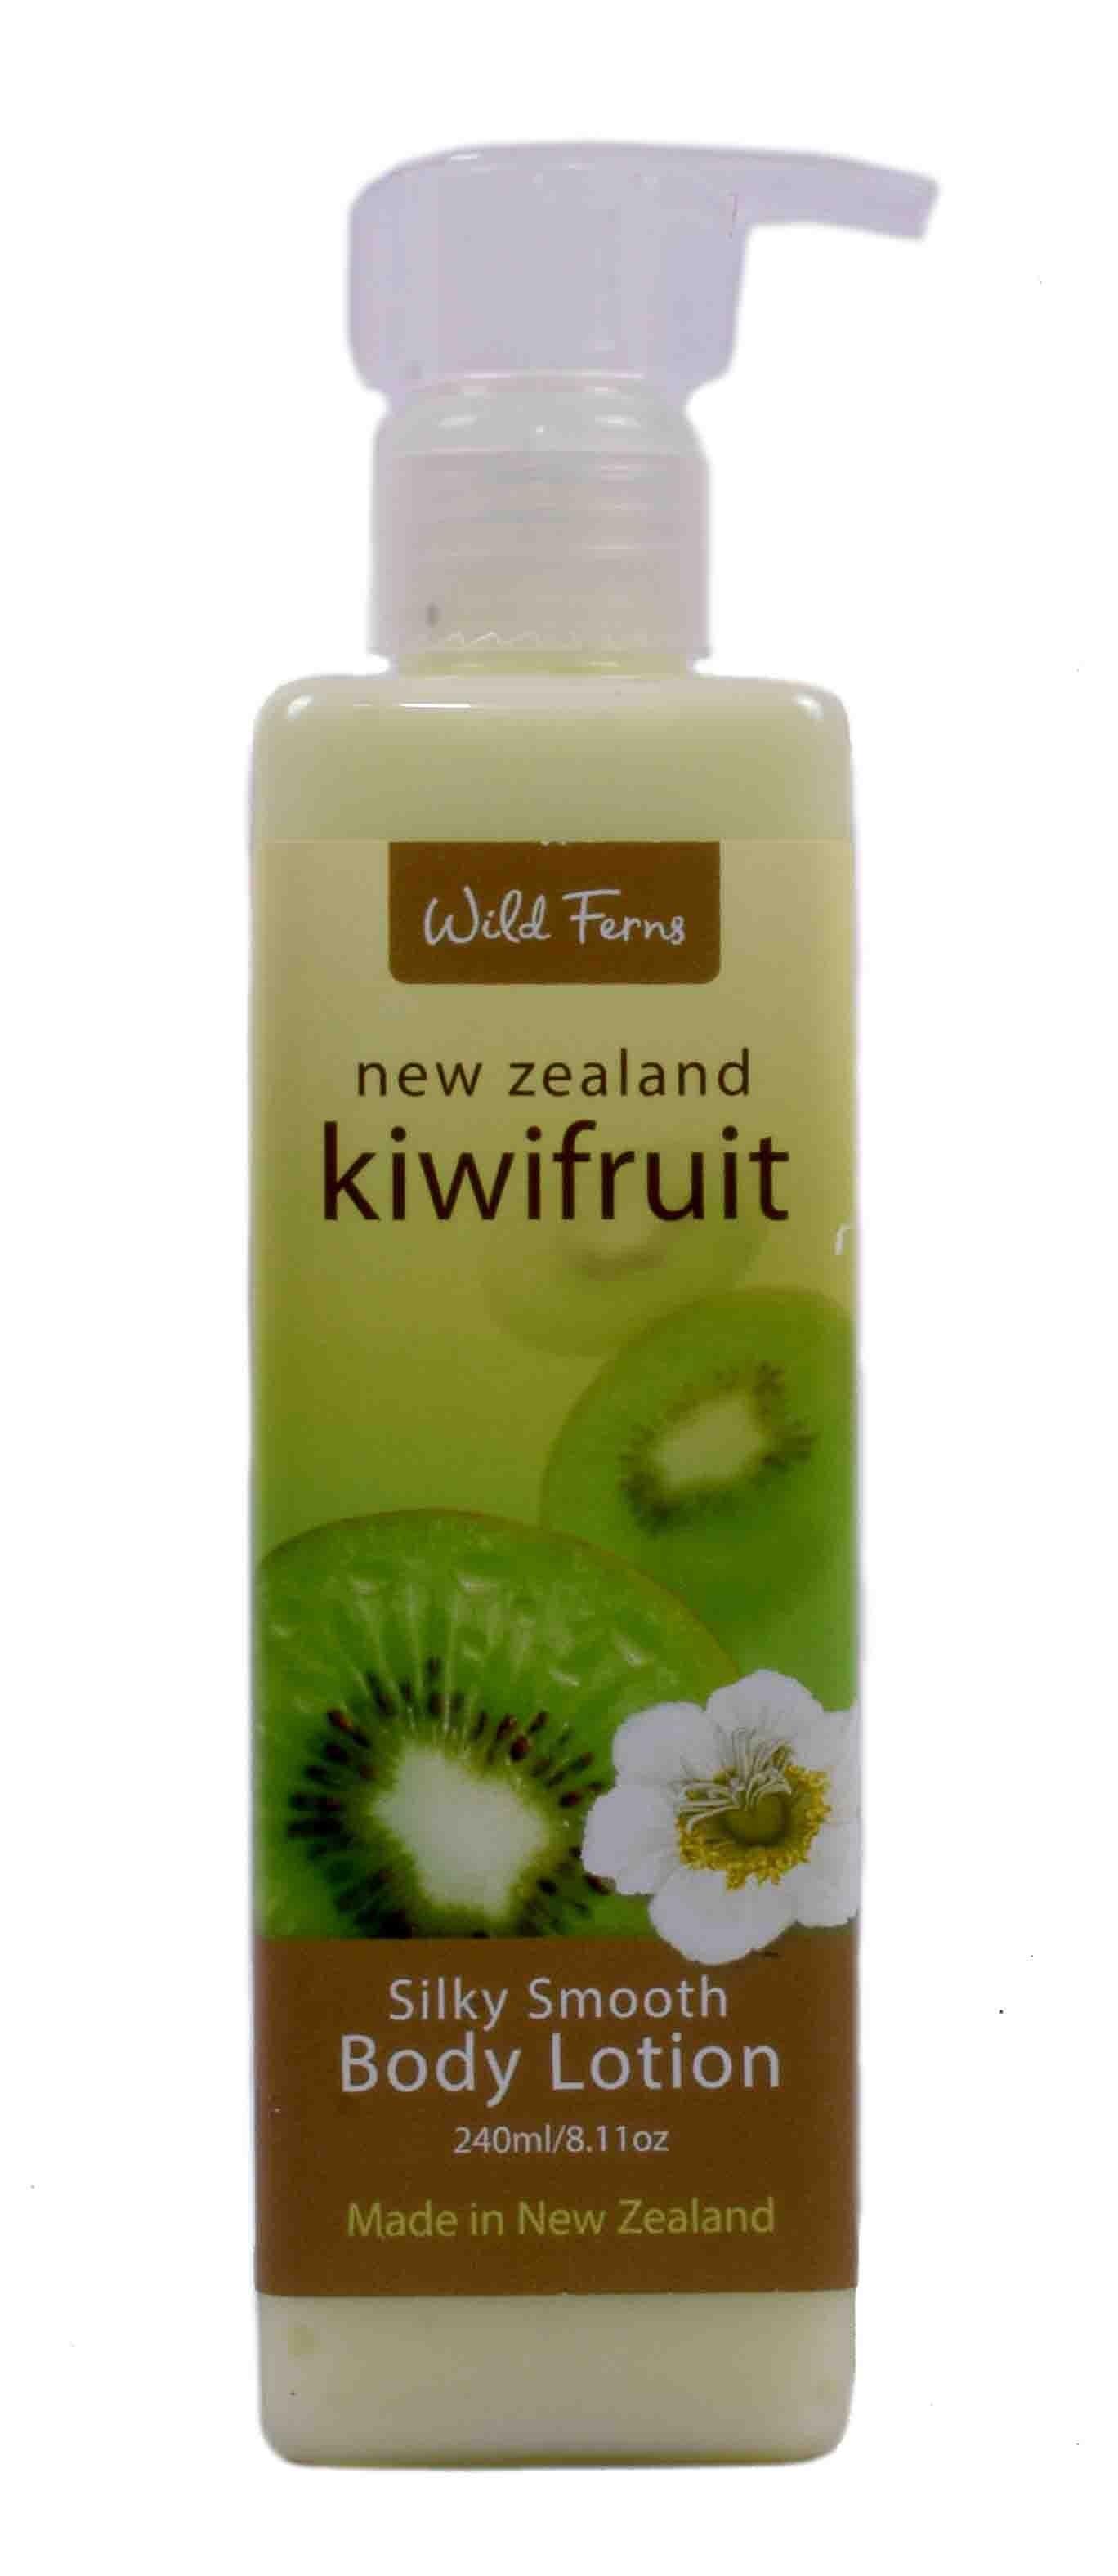 Wild Ferns Kiwifruit Body Lotion 240 ML